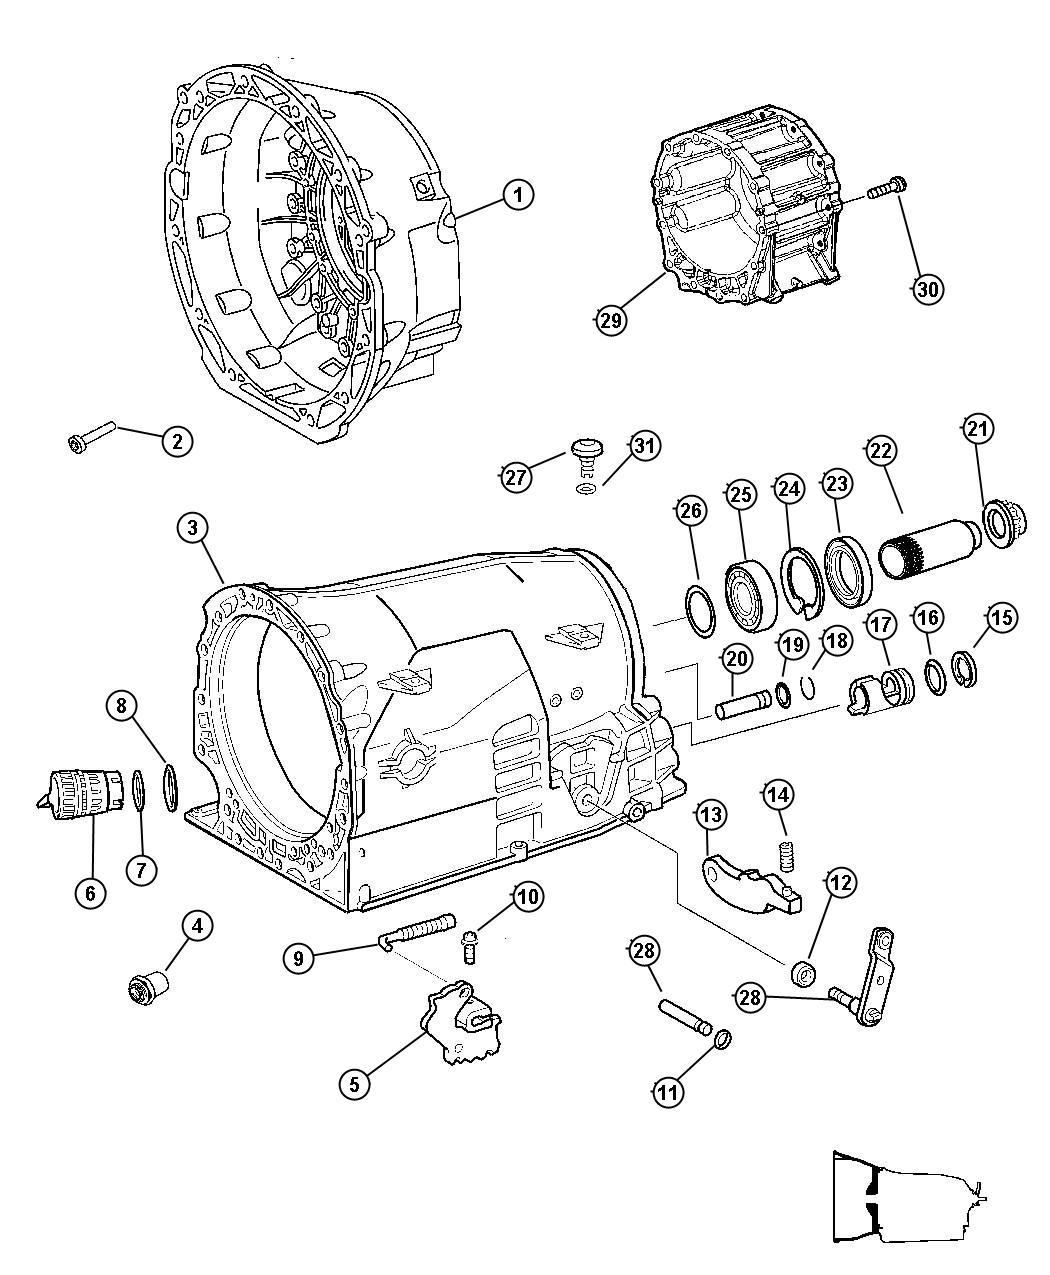 Dodge Magnum R T 5 7l Hemi V8 O Ring Plug Adapter